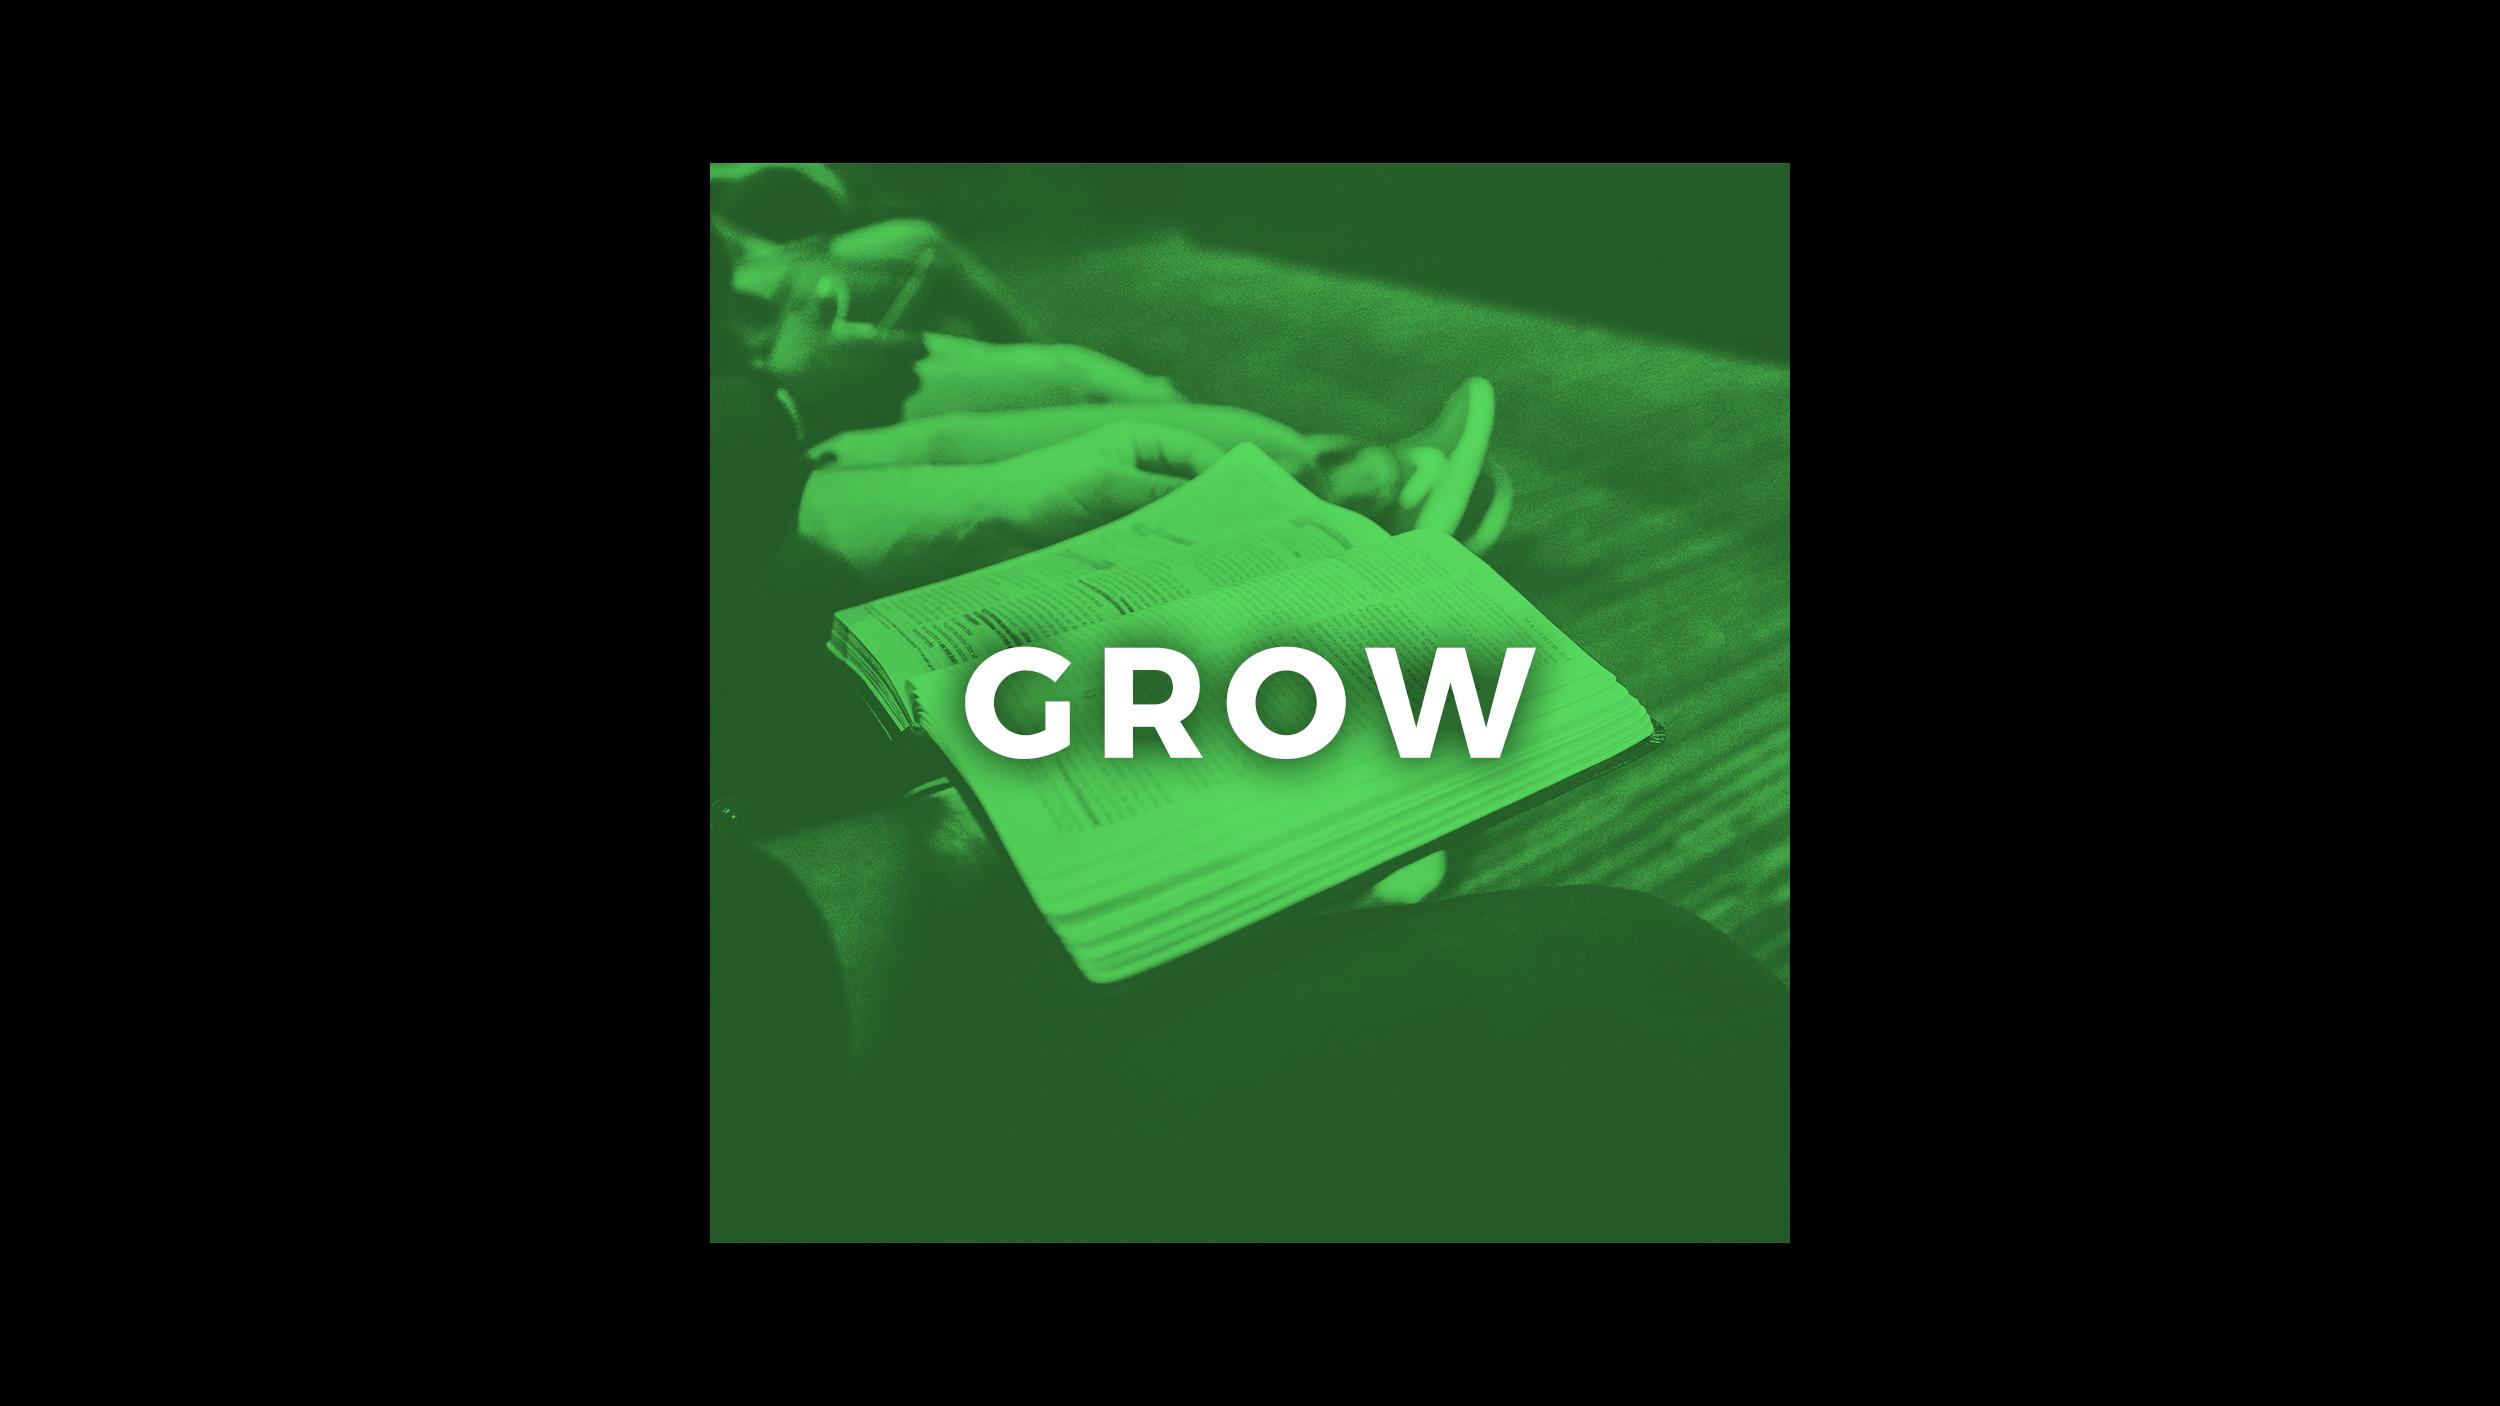 Five Purposes - Grow - 16-9.png